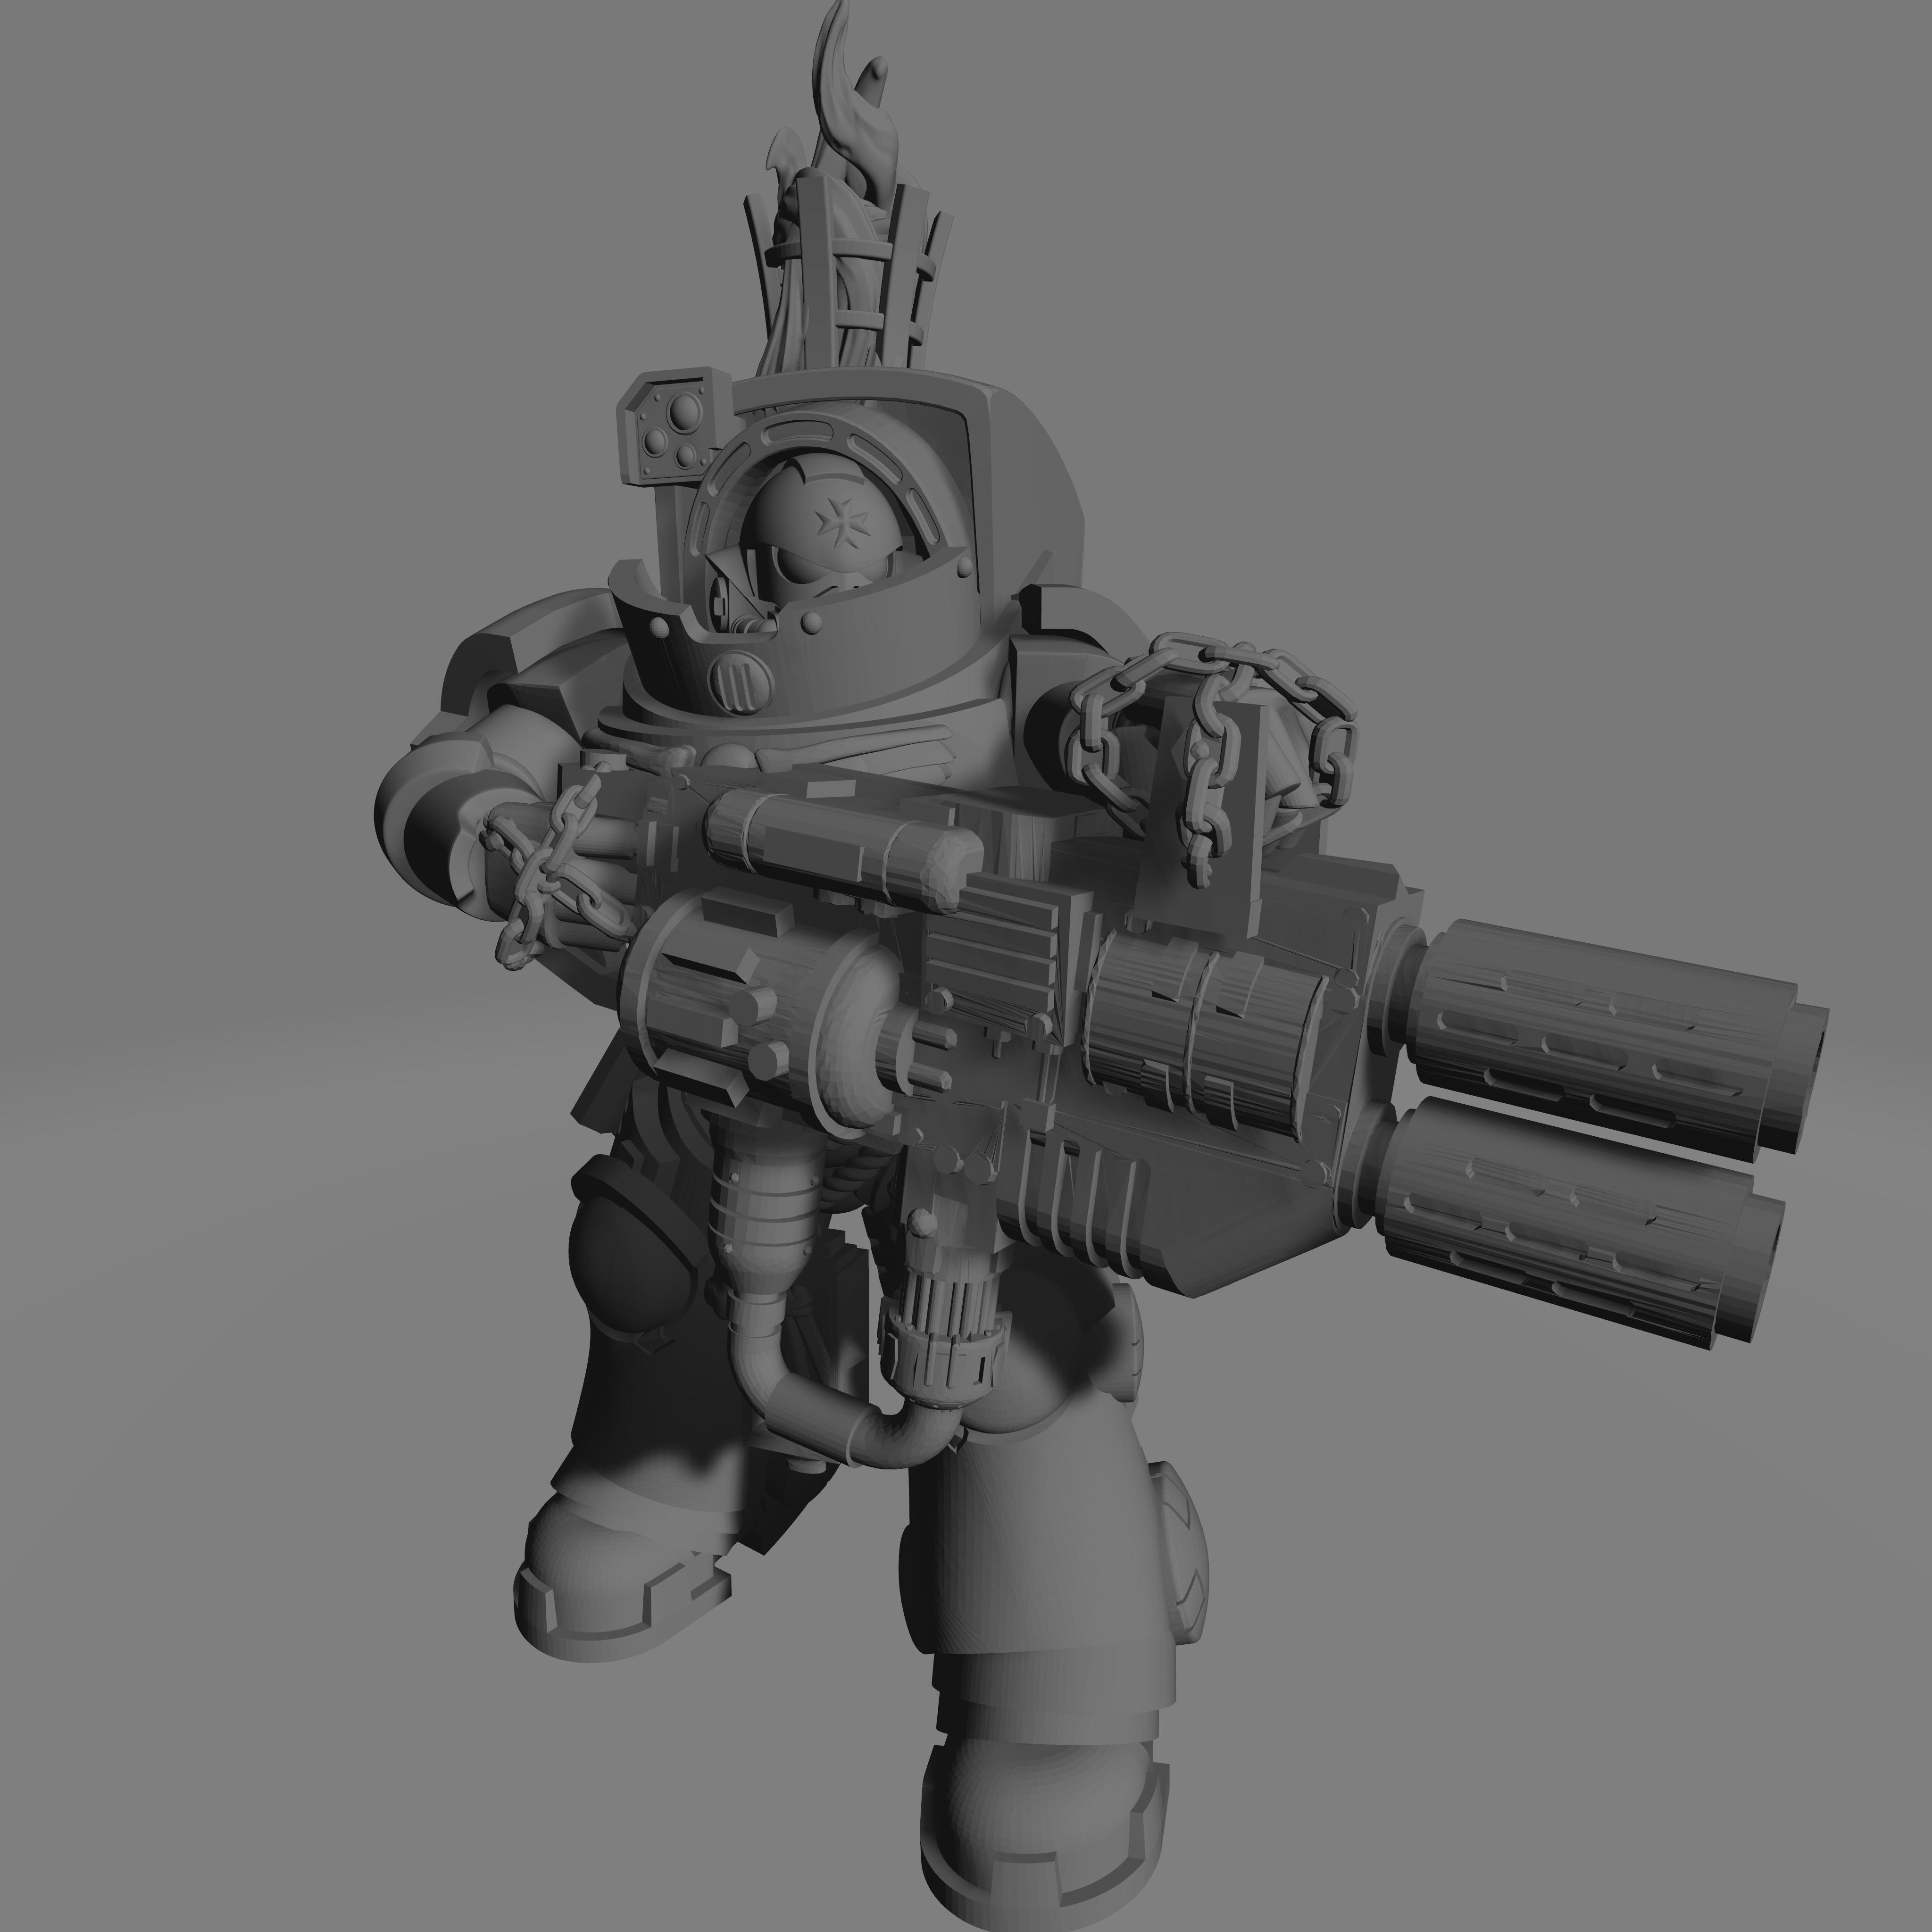 Dark Crusader Heavy Infantry Liquidators - 04 - Heavy 1.jpg Download free STL file Dark Crusader Heavy Infantry Liquidator Squad • 3D printing design, GrimmTheMaker